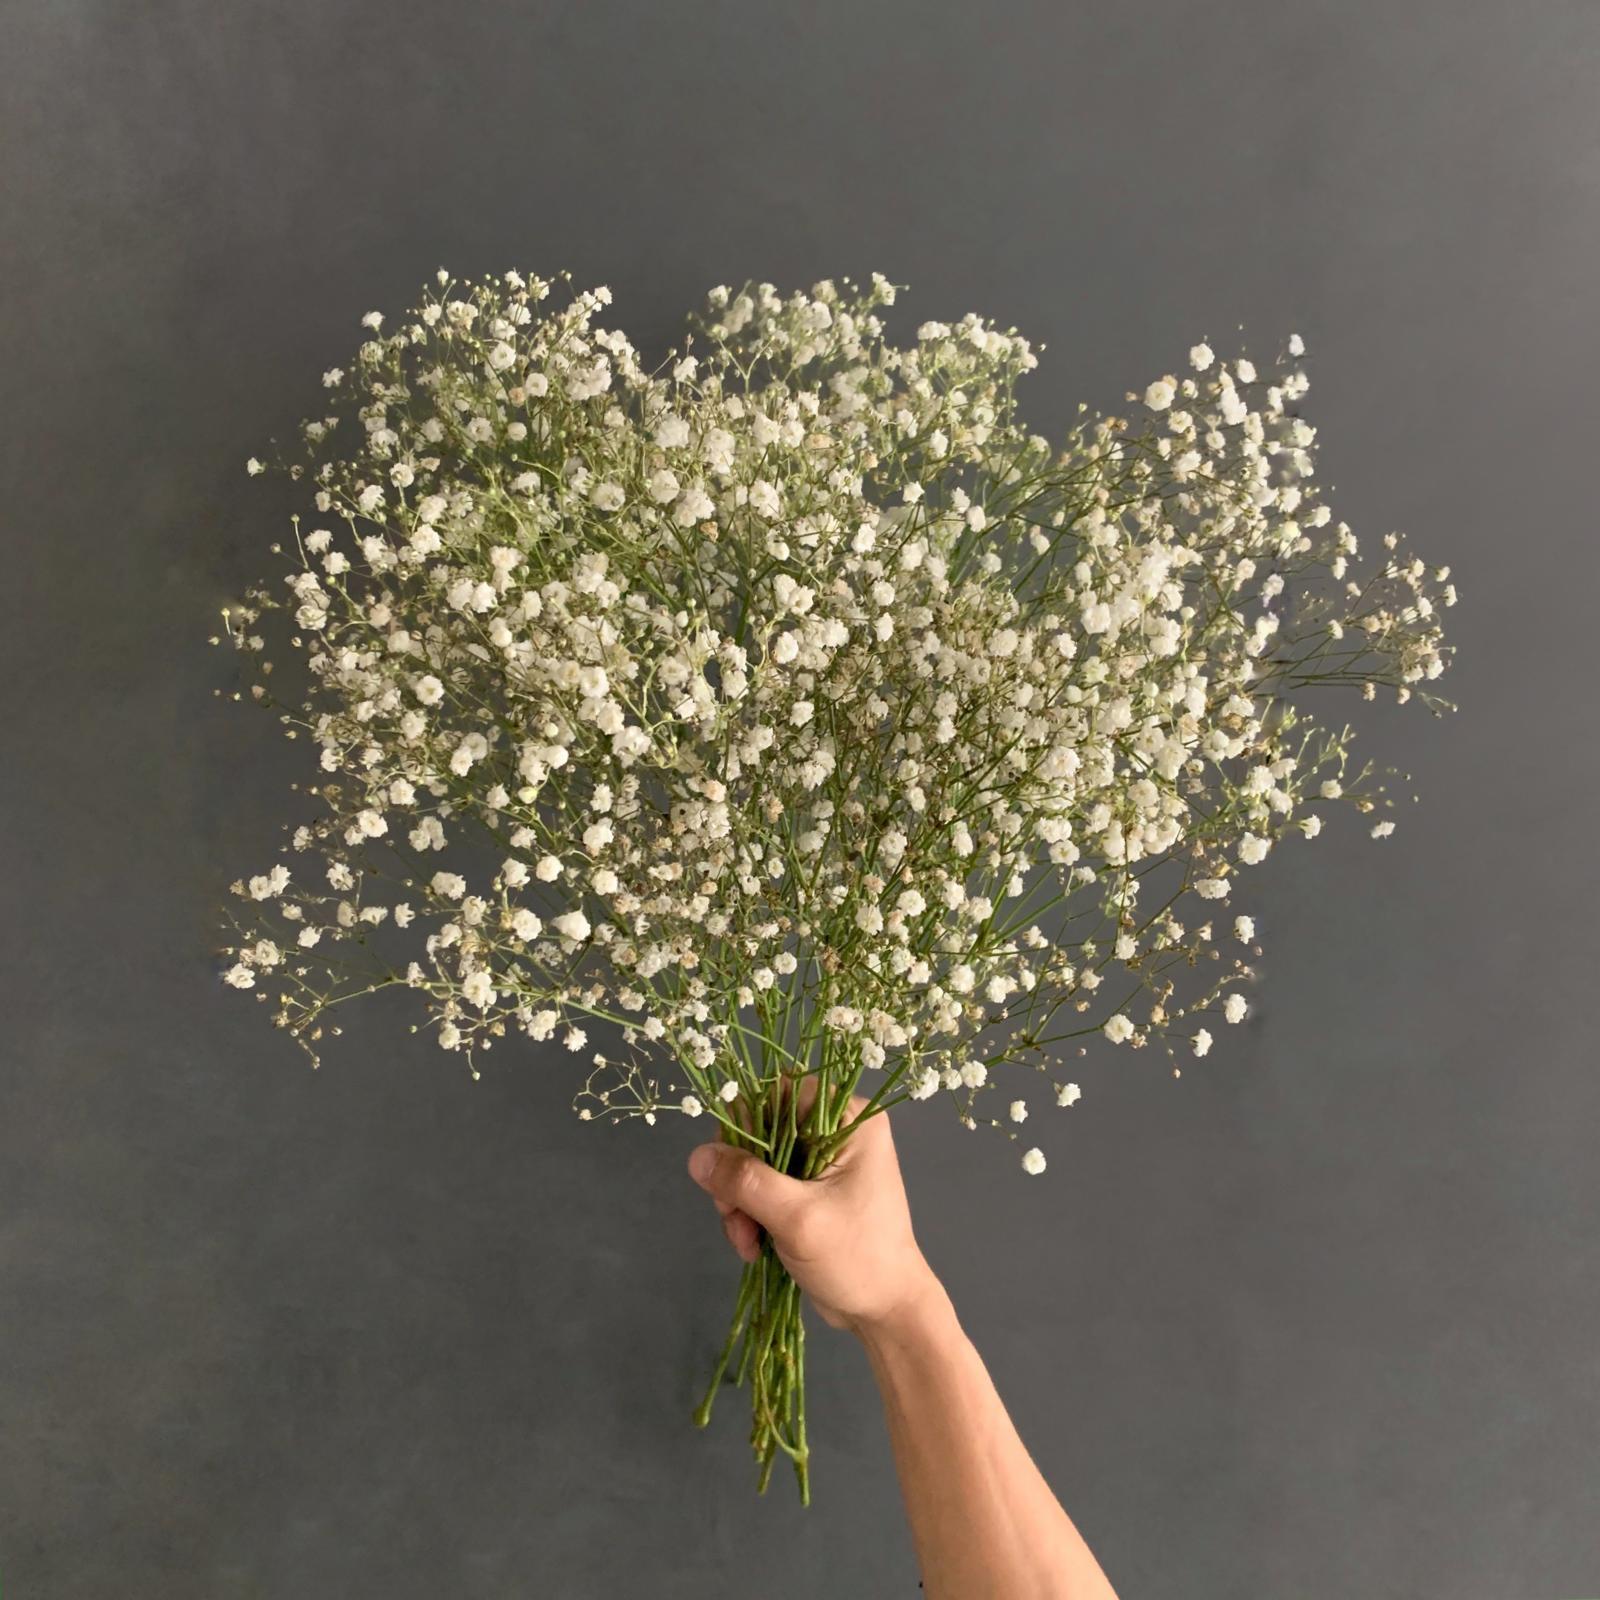 Gypsophilla White 'Wholesale Flowers'